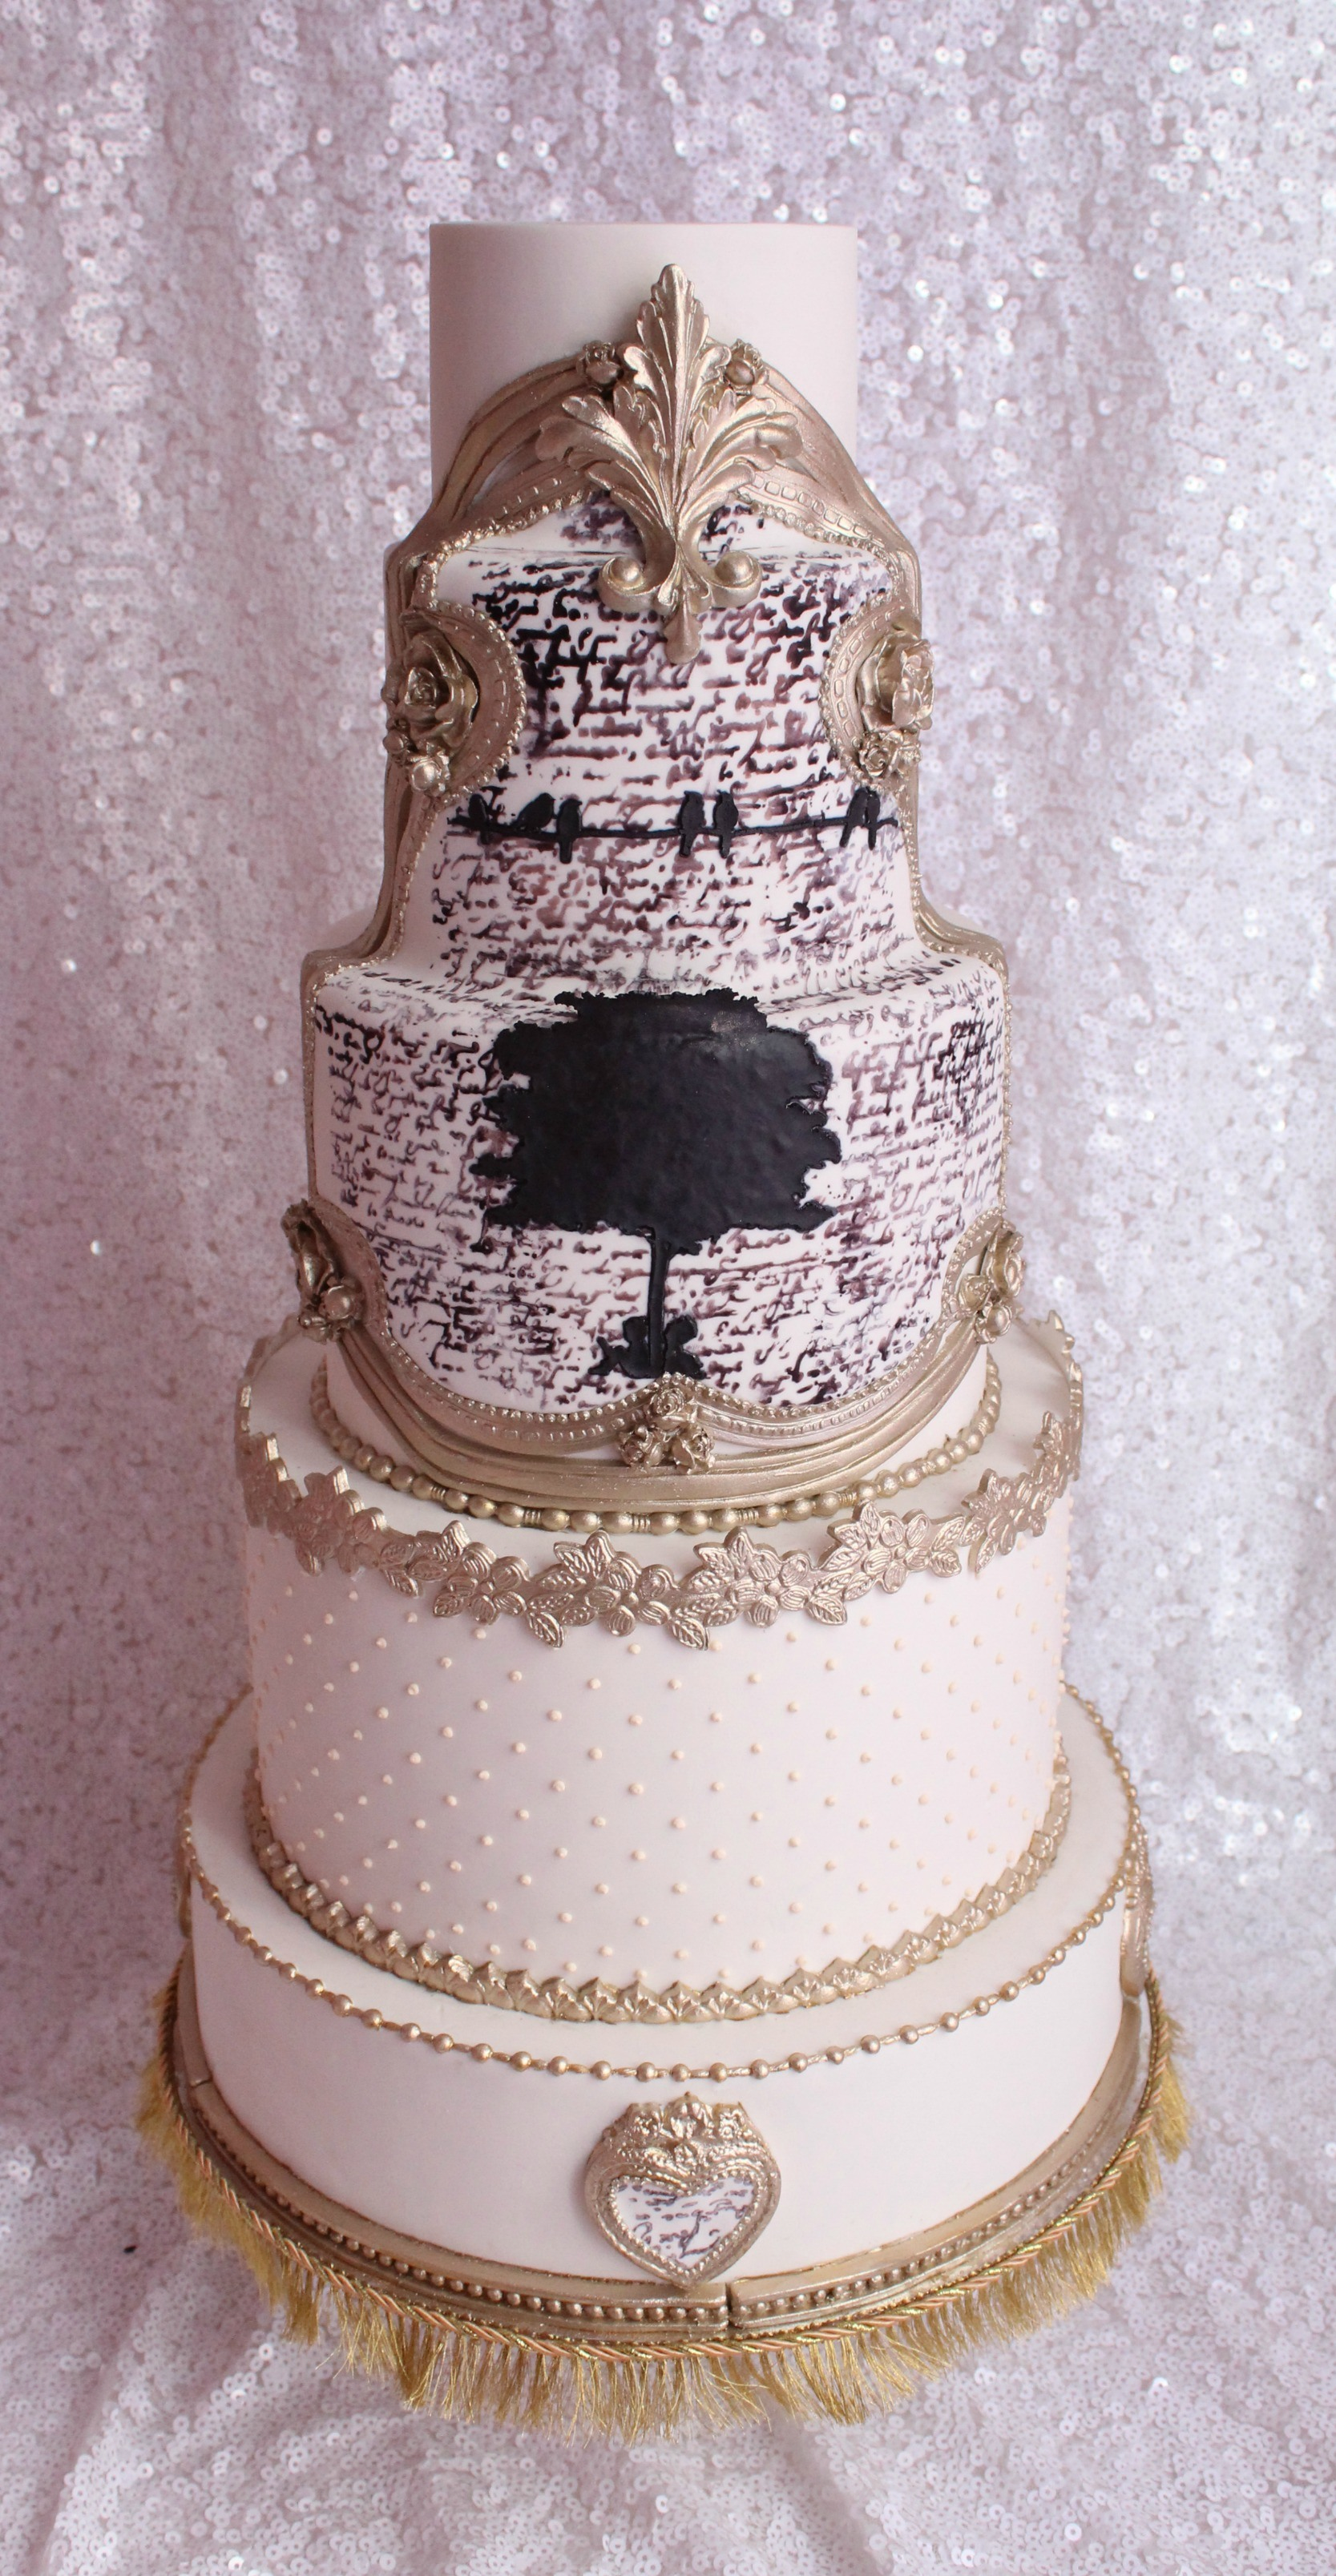 Baroque Rococo styled wedding cake